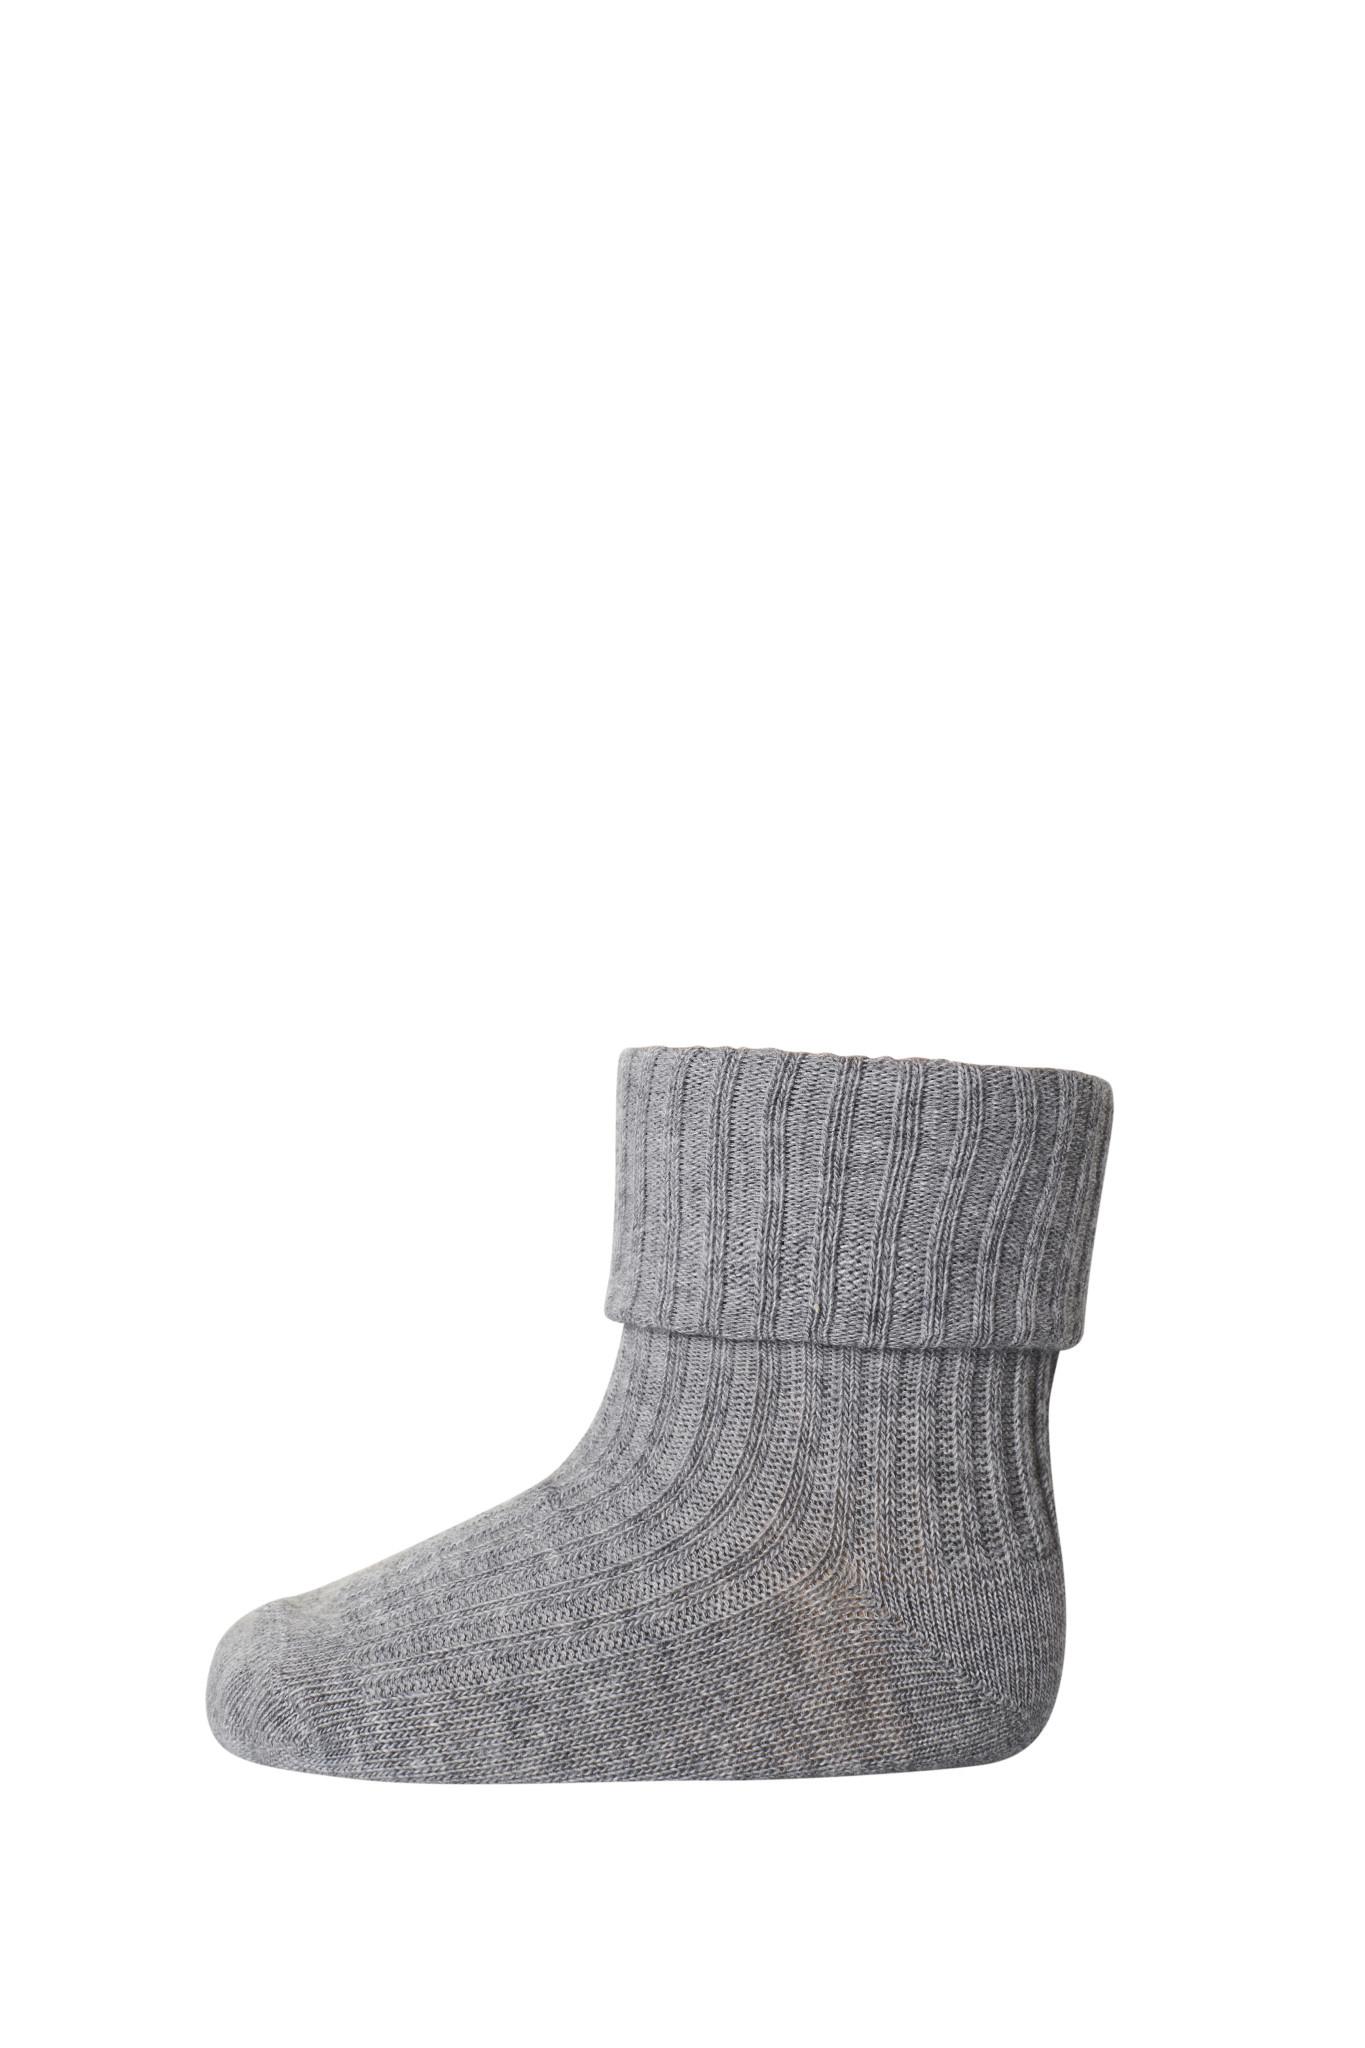 MP Denmark cotton rib sokjes - 491 grey melange-1